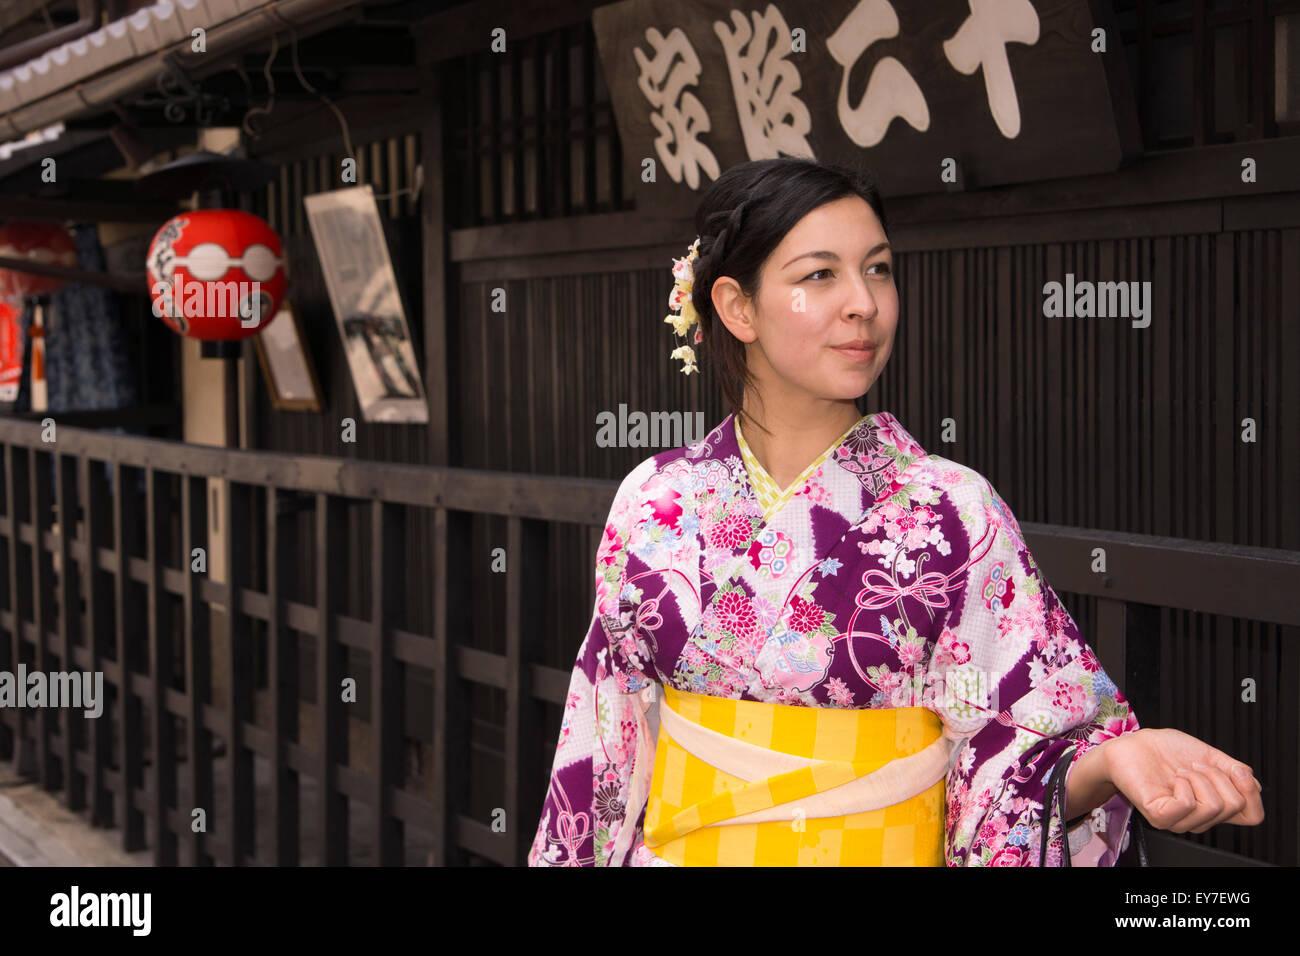 A young lady renting a kimono, enjoying walking around Gion, Kyoto. Stock Photo